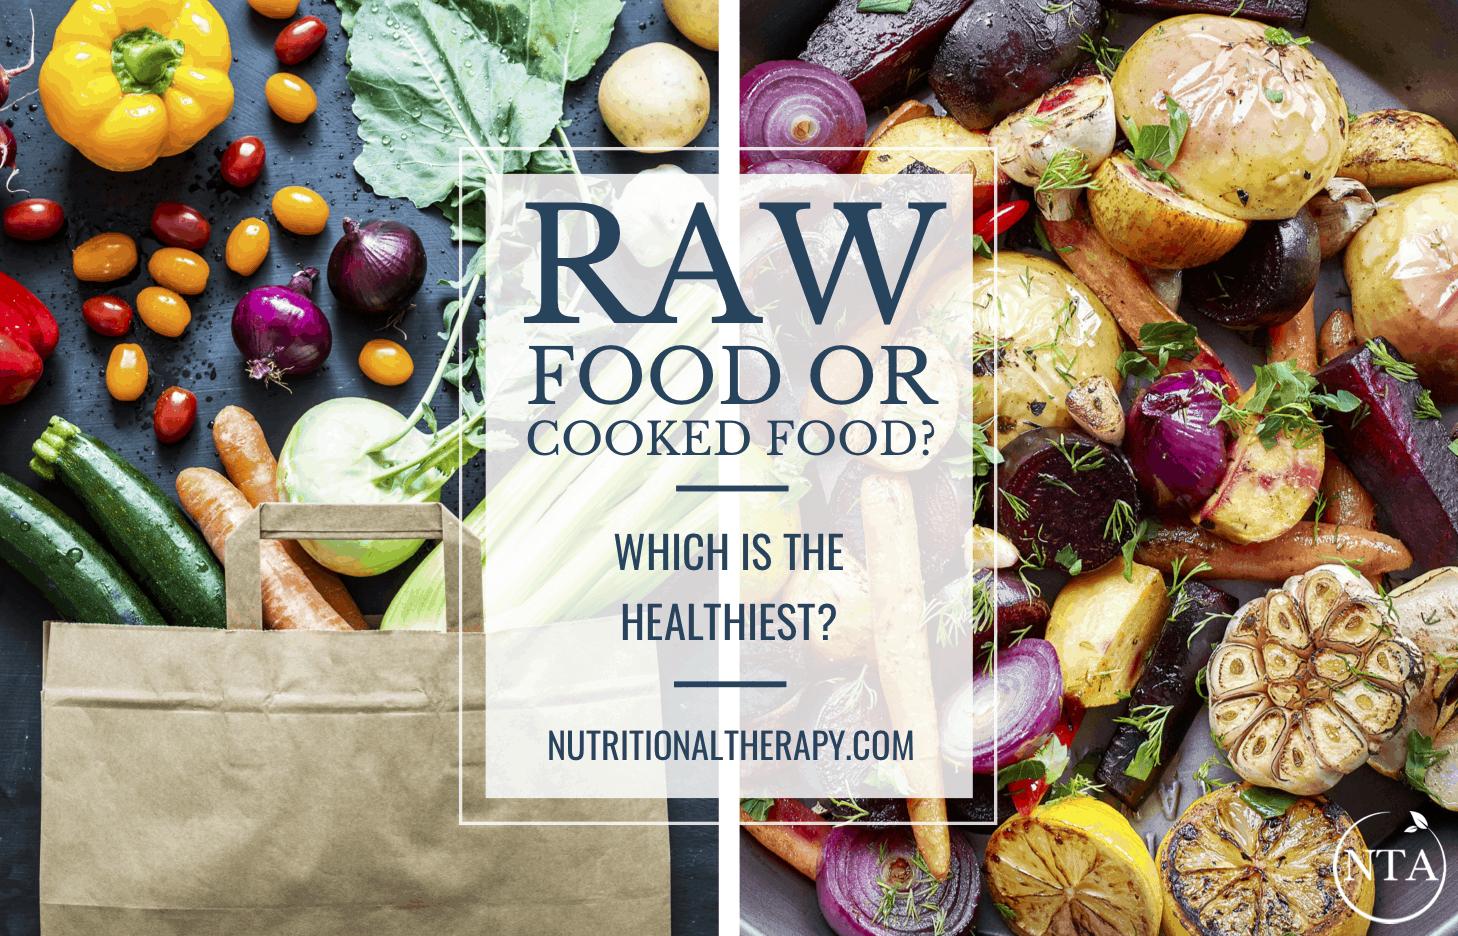 Raw Food - The NTA